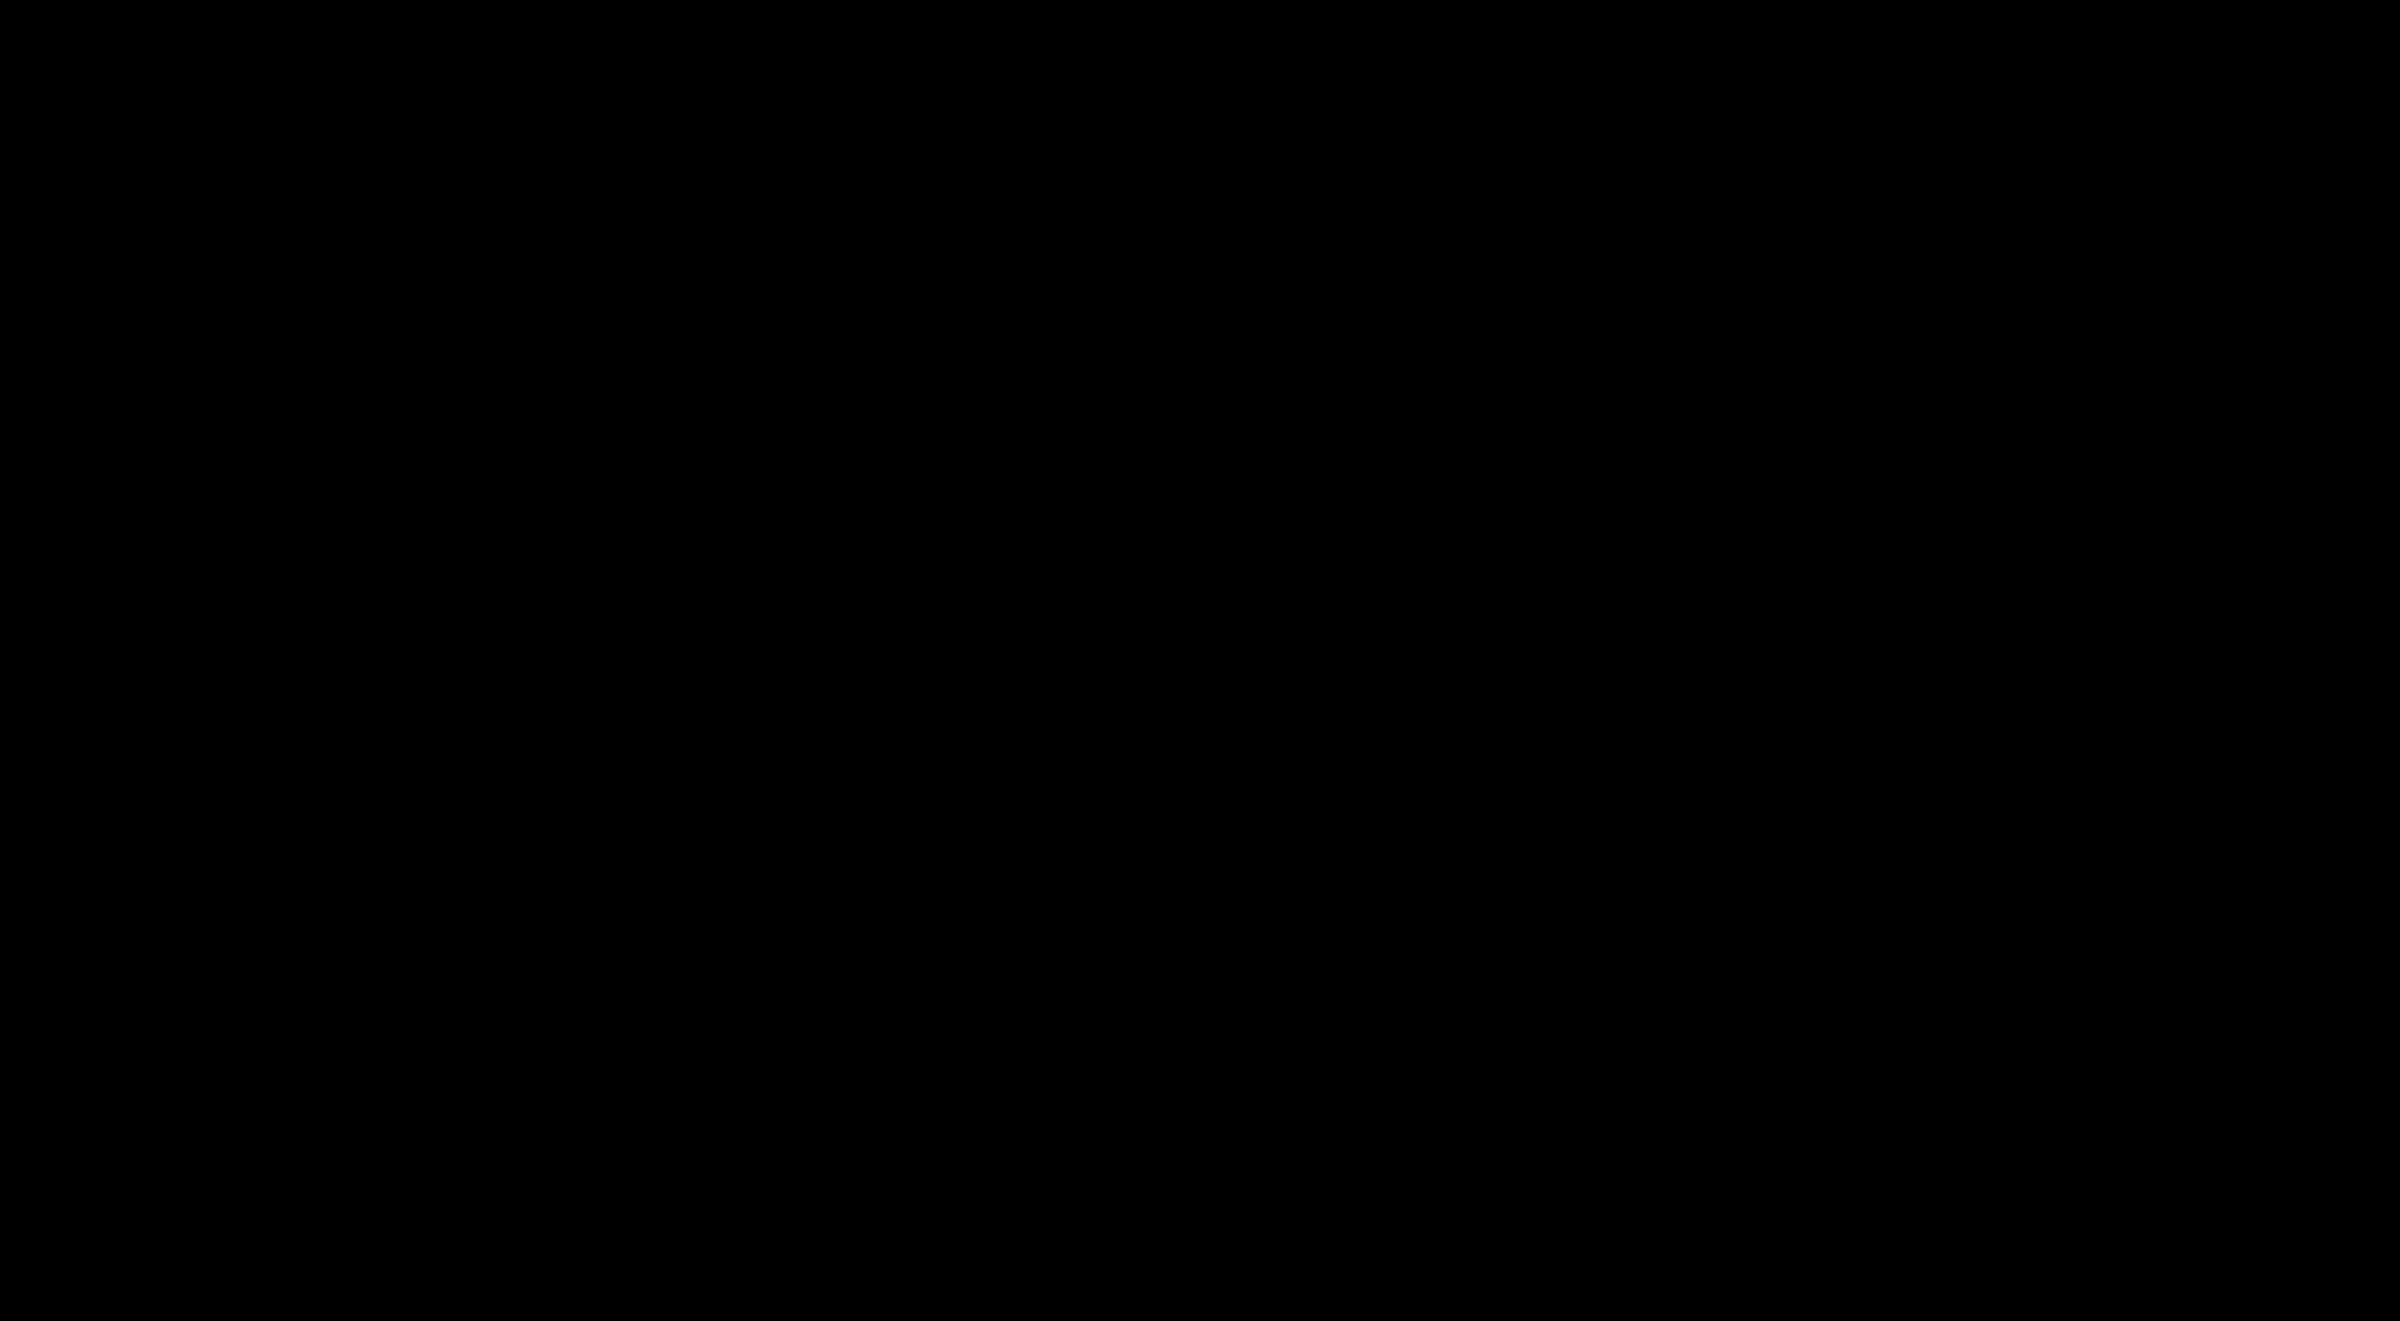 2400x1321 Clipart